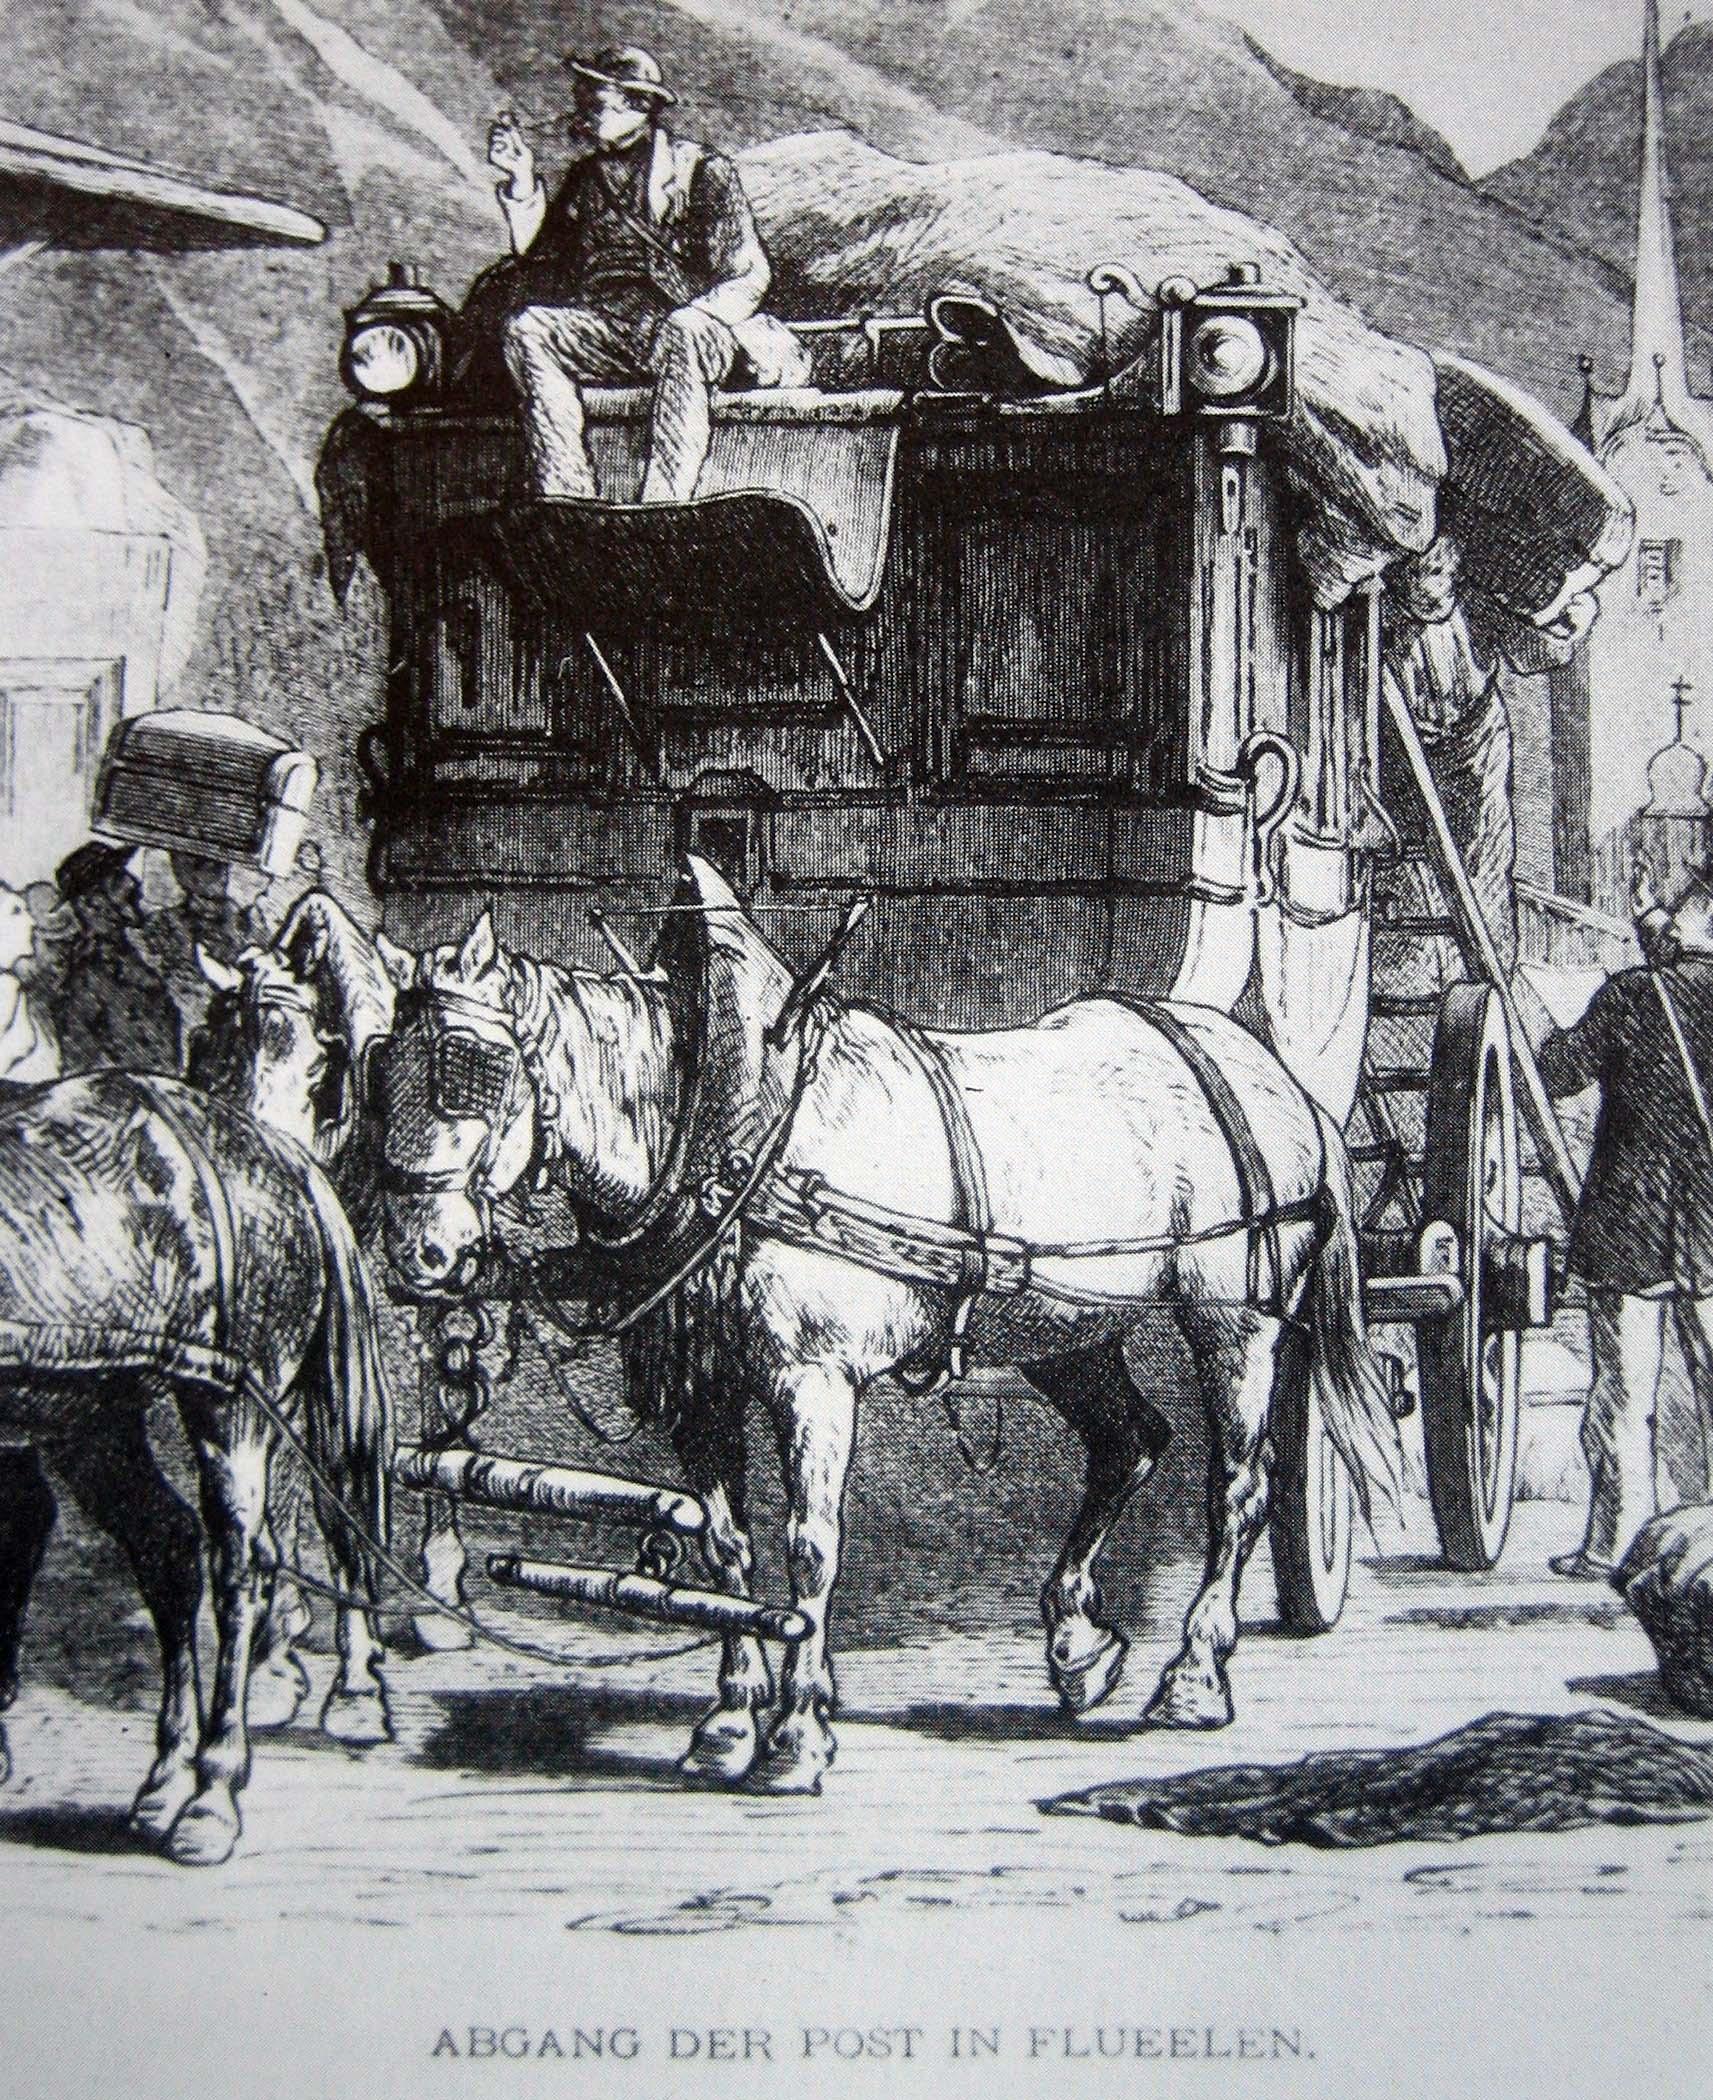 File:Flüelen Postabfahrt 1820.jpg